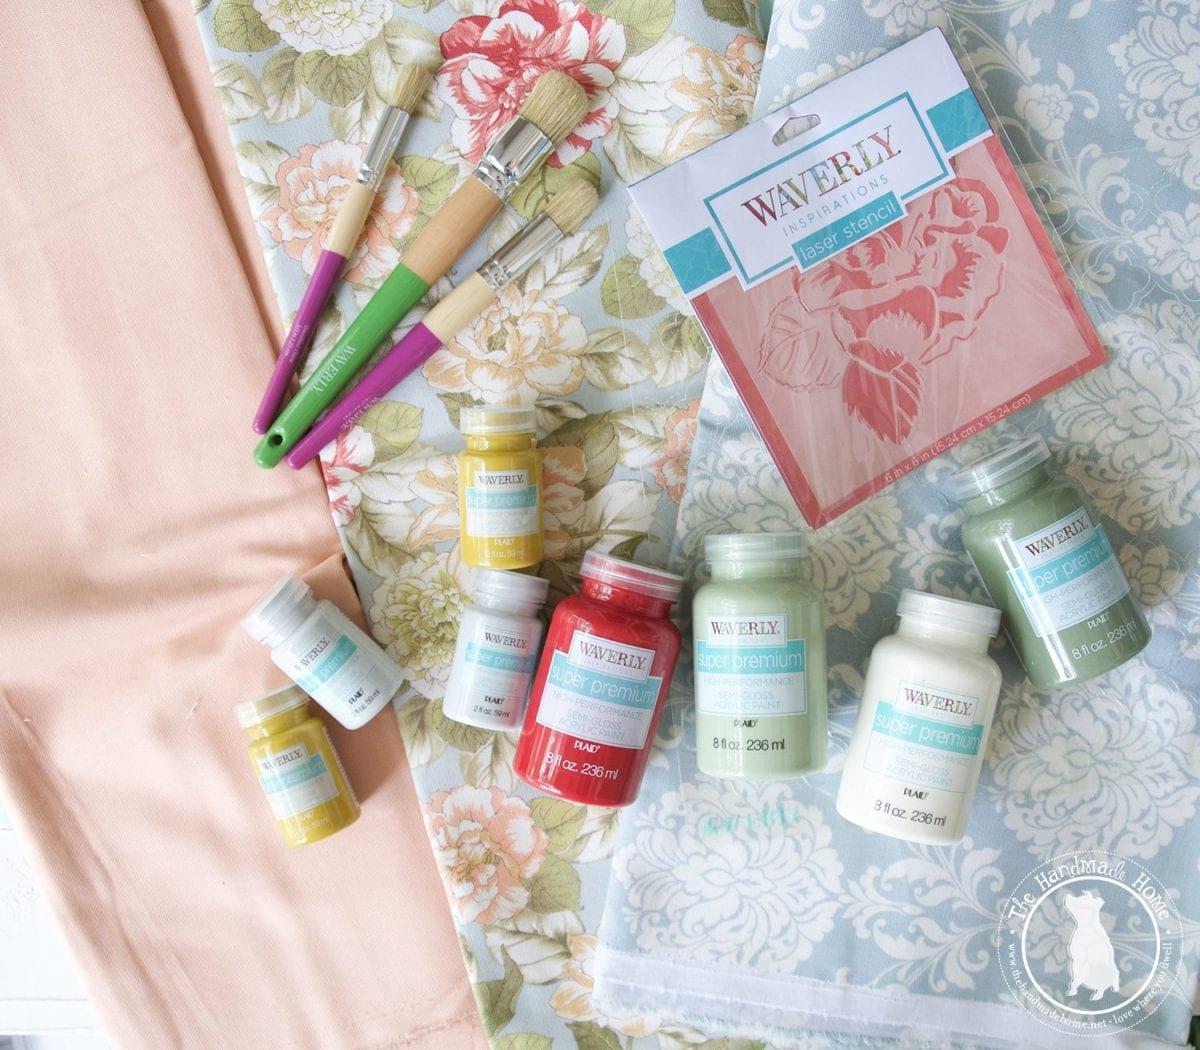 waverly_fabrics_and_craft_supplies